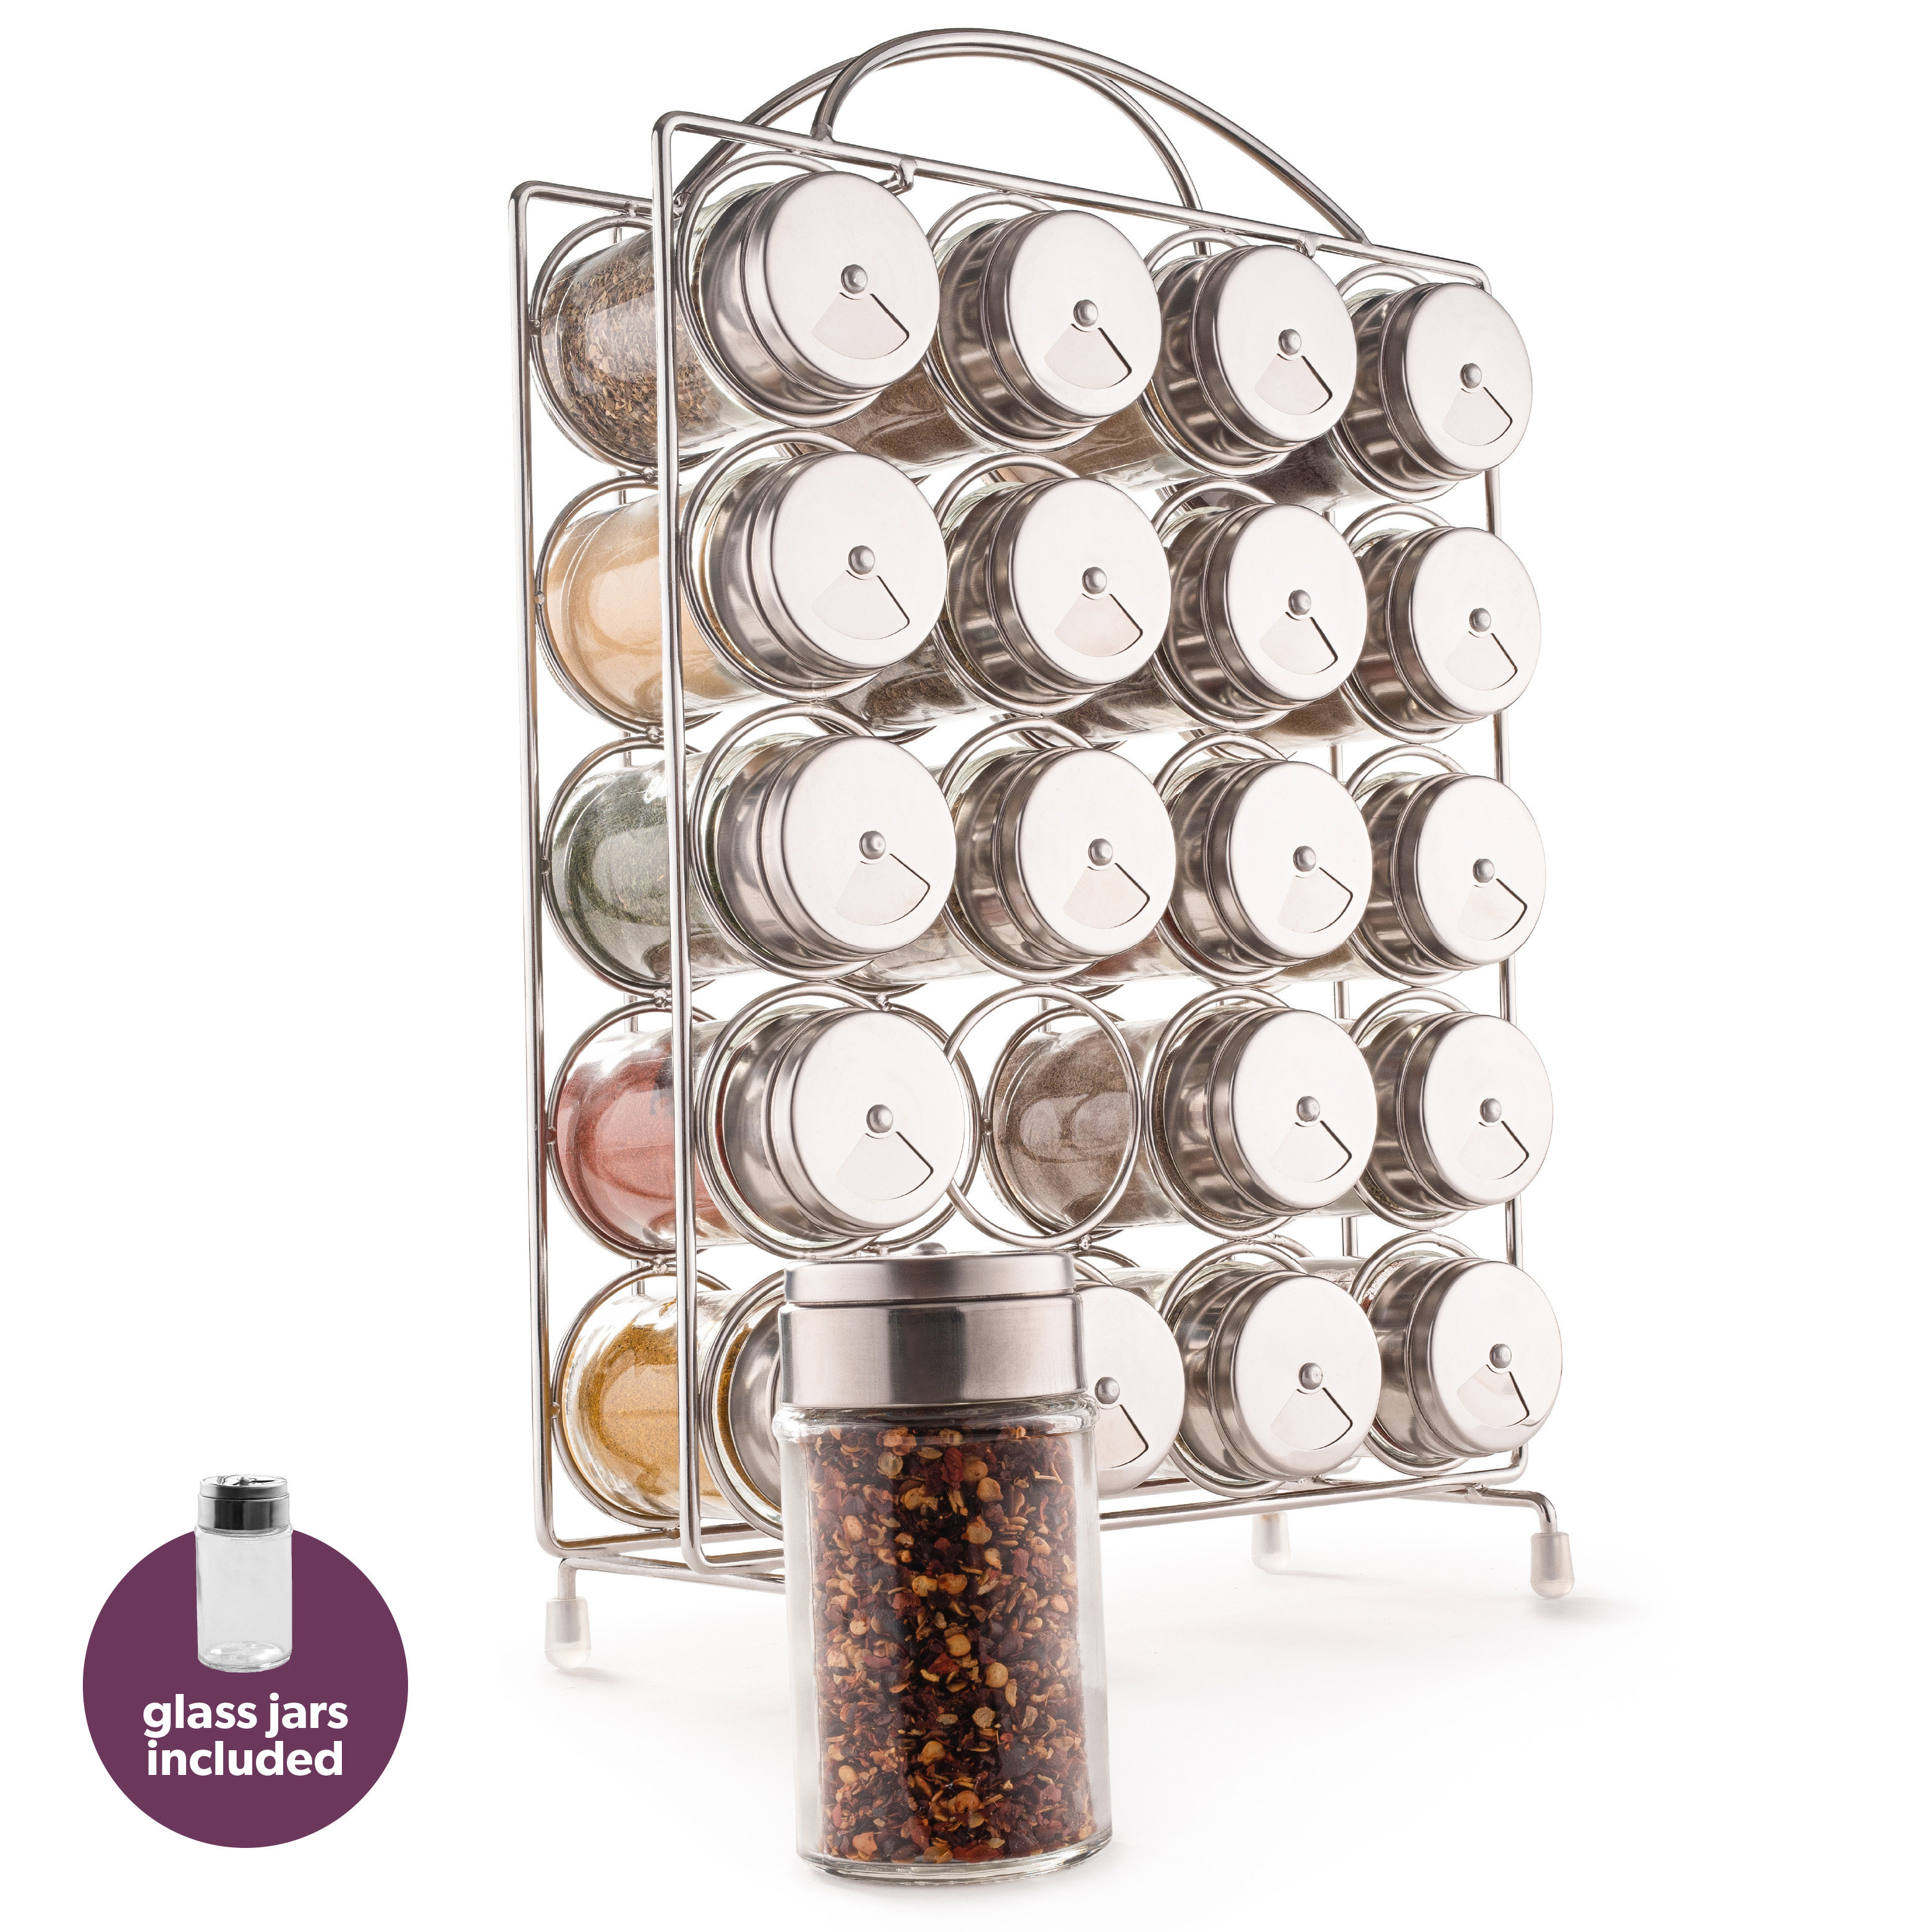 vertical spice rack organizer 20 jars included